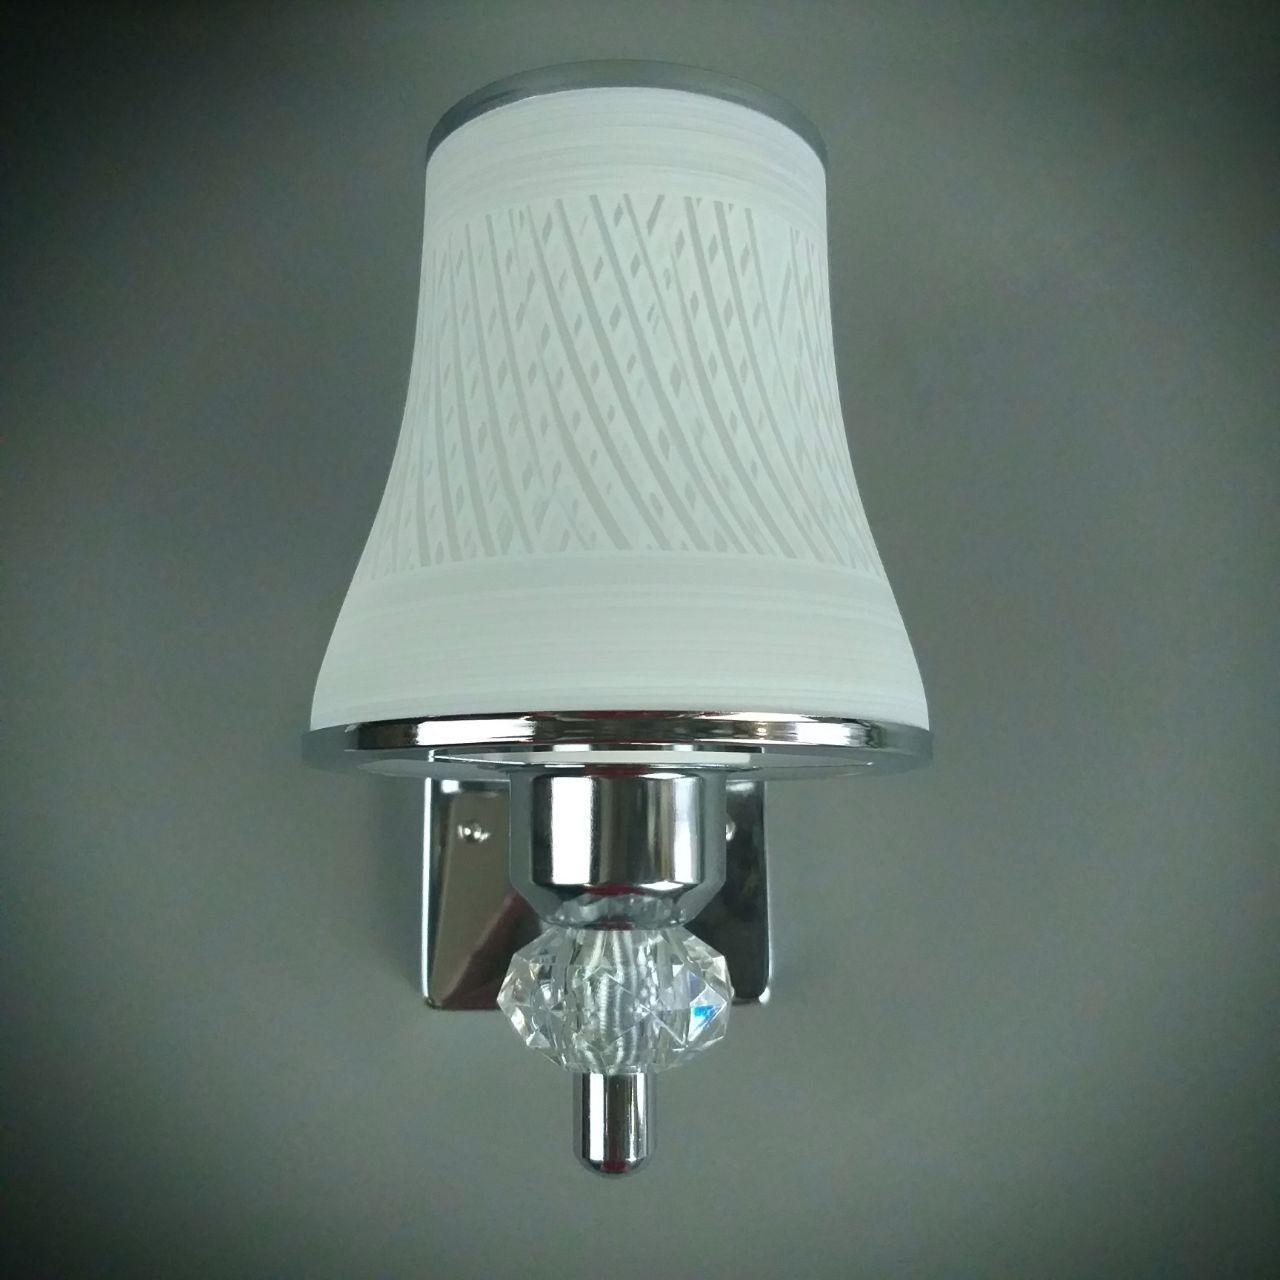 Бра на одну лампу в хроме HQ-8212/1W (12шт)